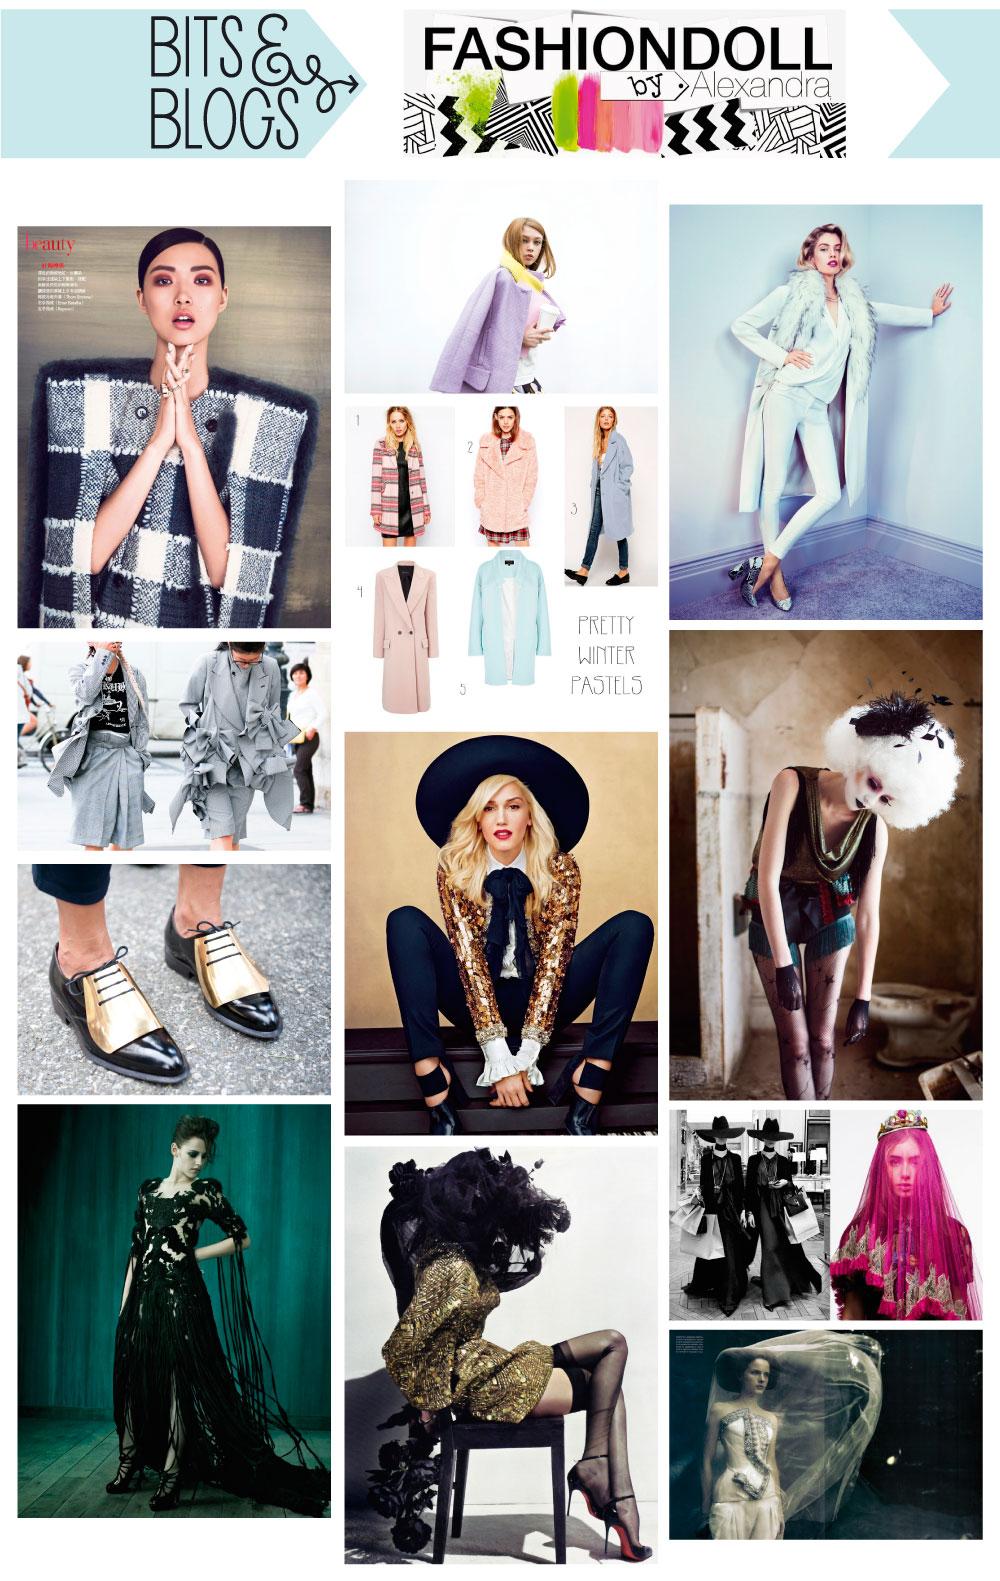 Image© Fashion Doll